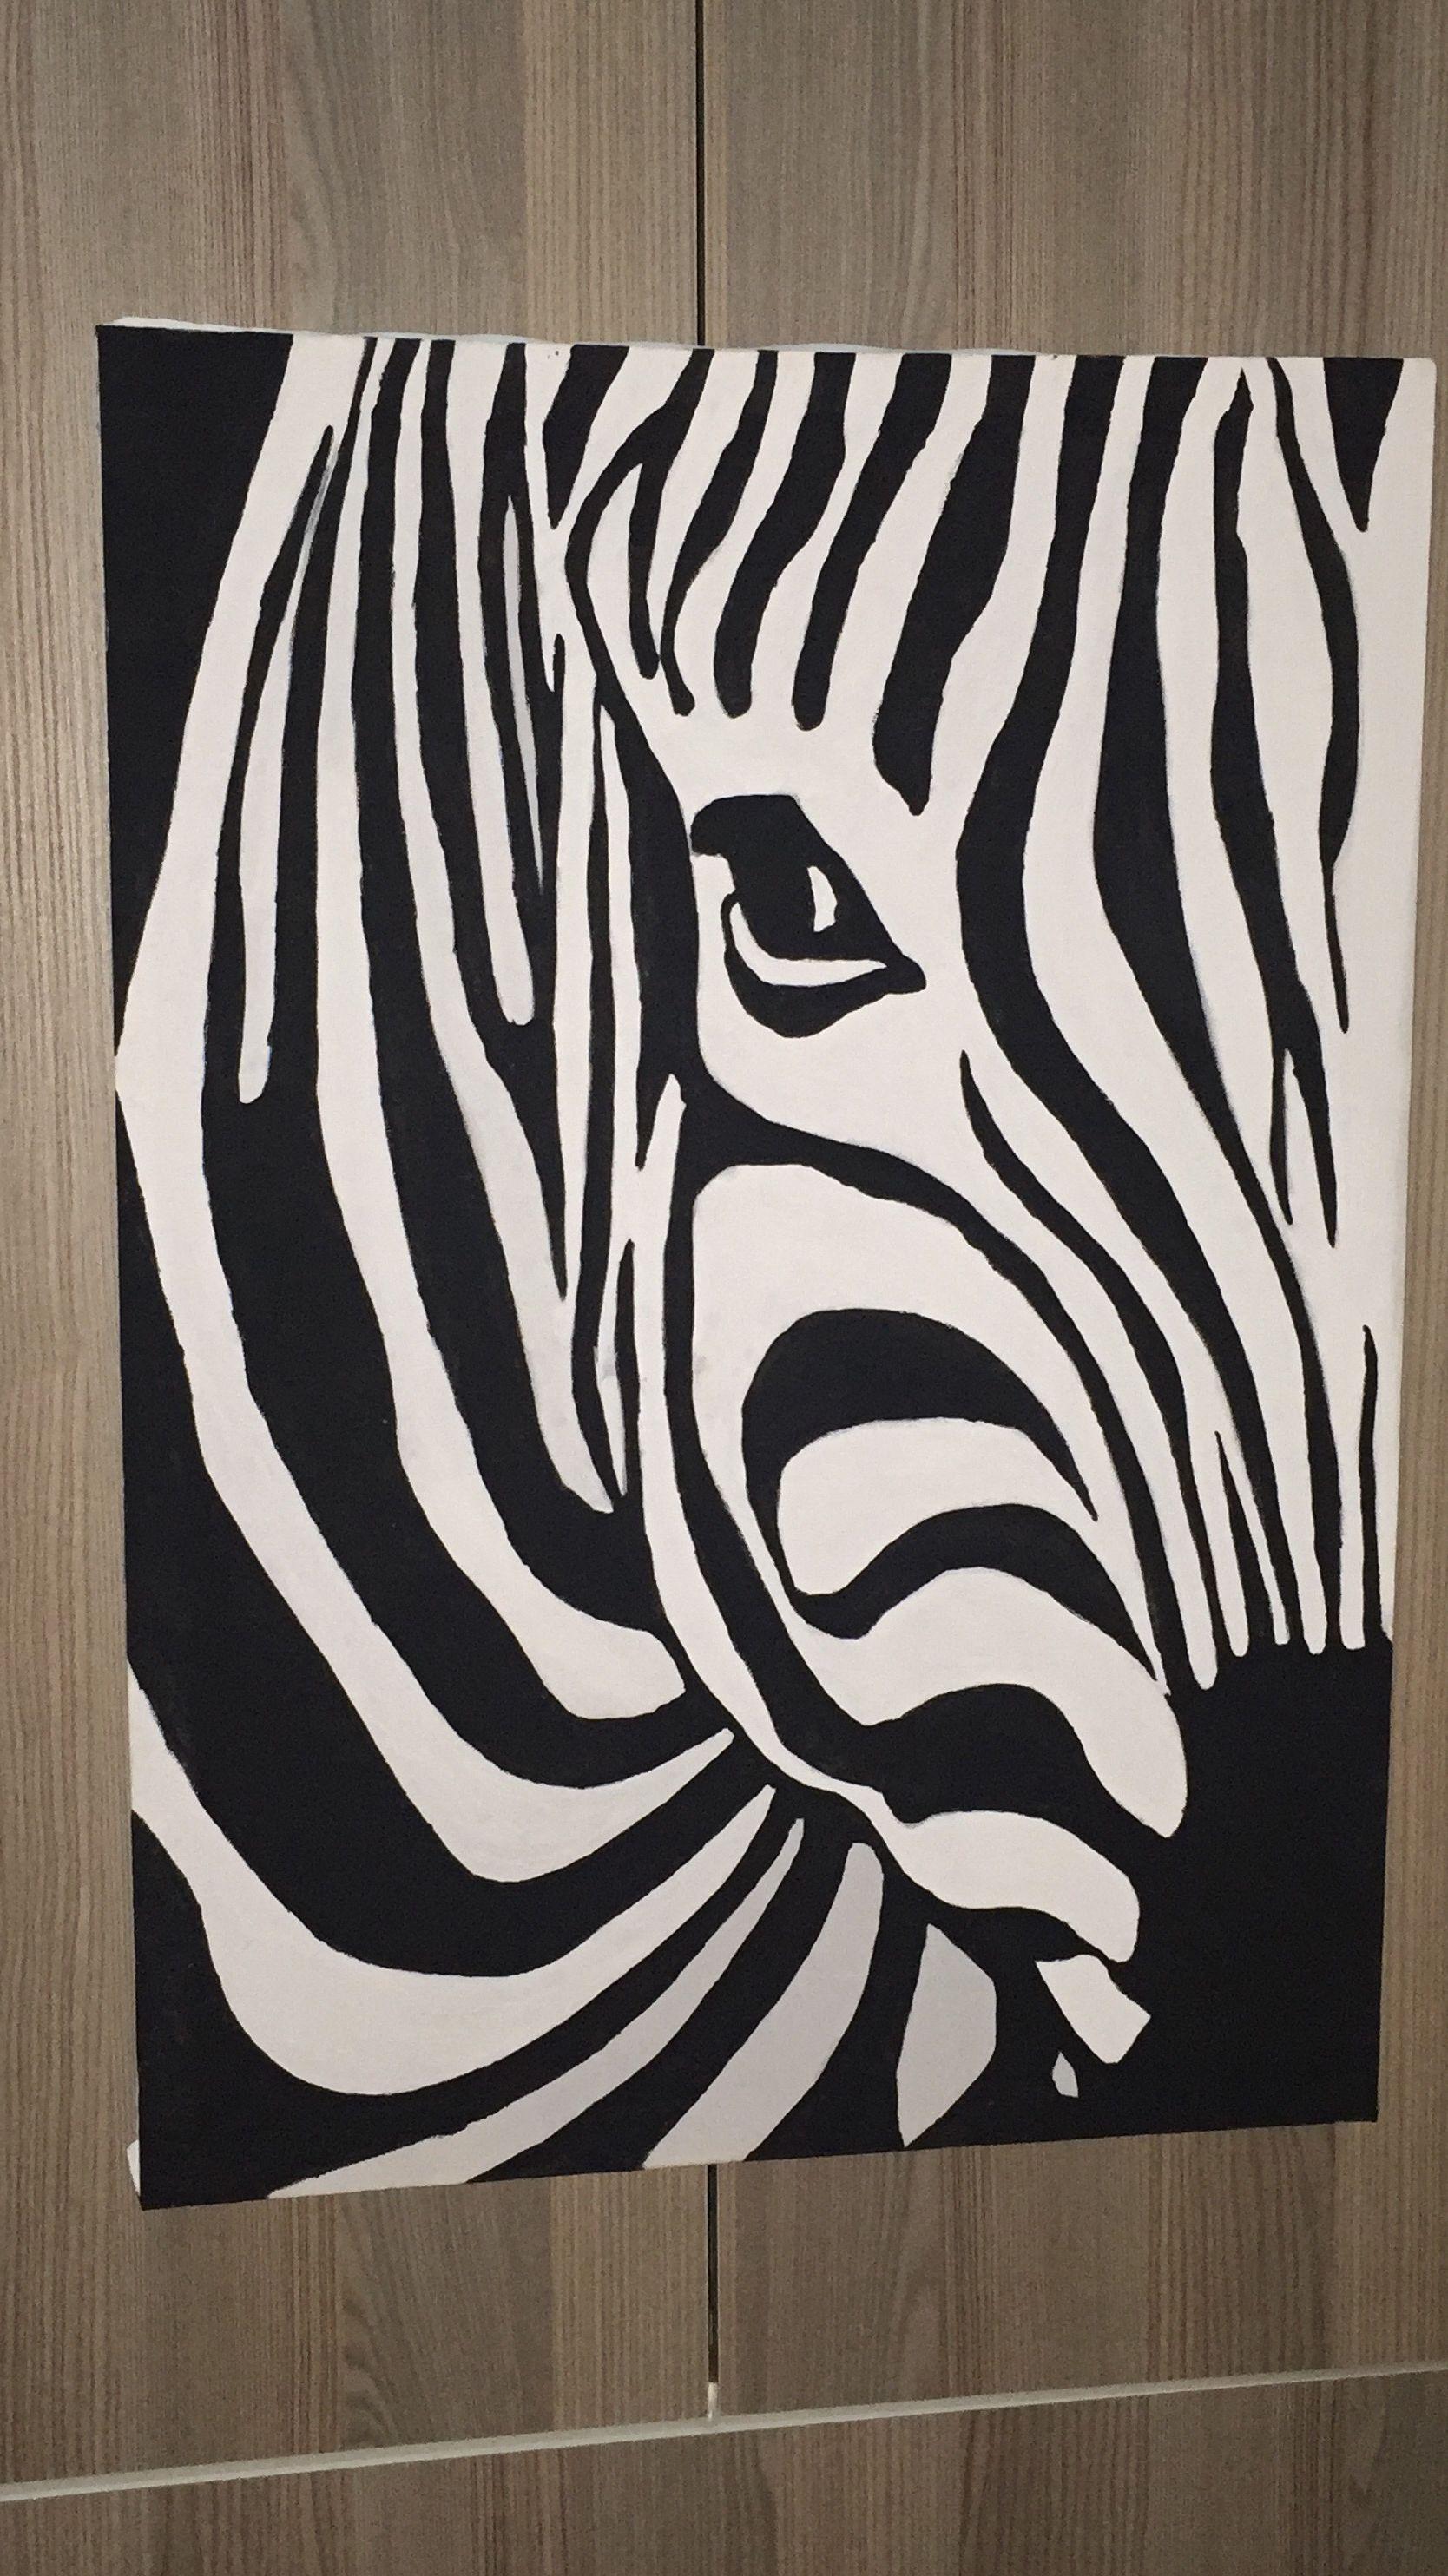 Zebra Siyahbeyazguzeldir Guajboya Missioncomplete Pencil Drawings Zebra Animal Print Rug